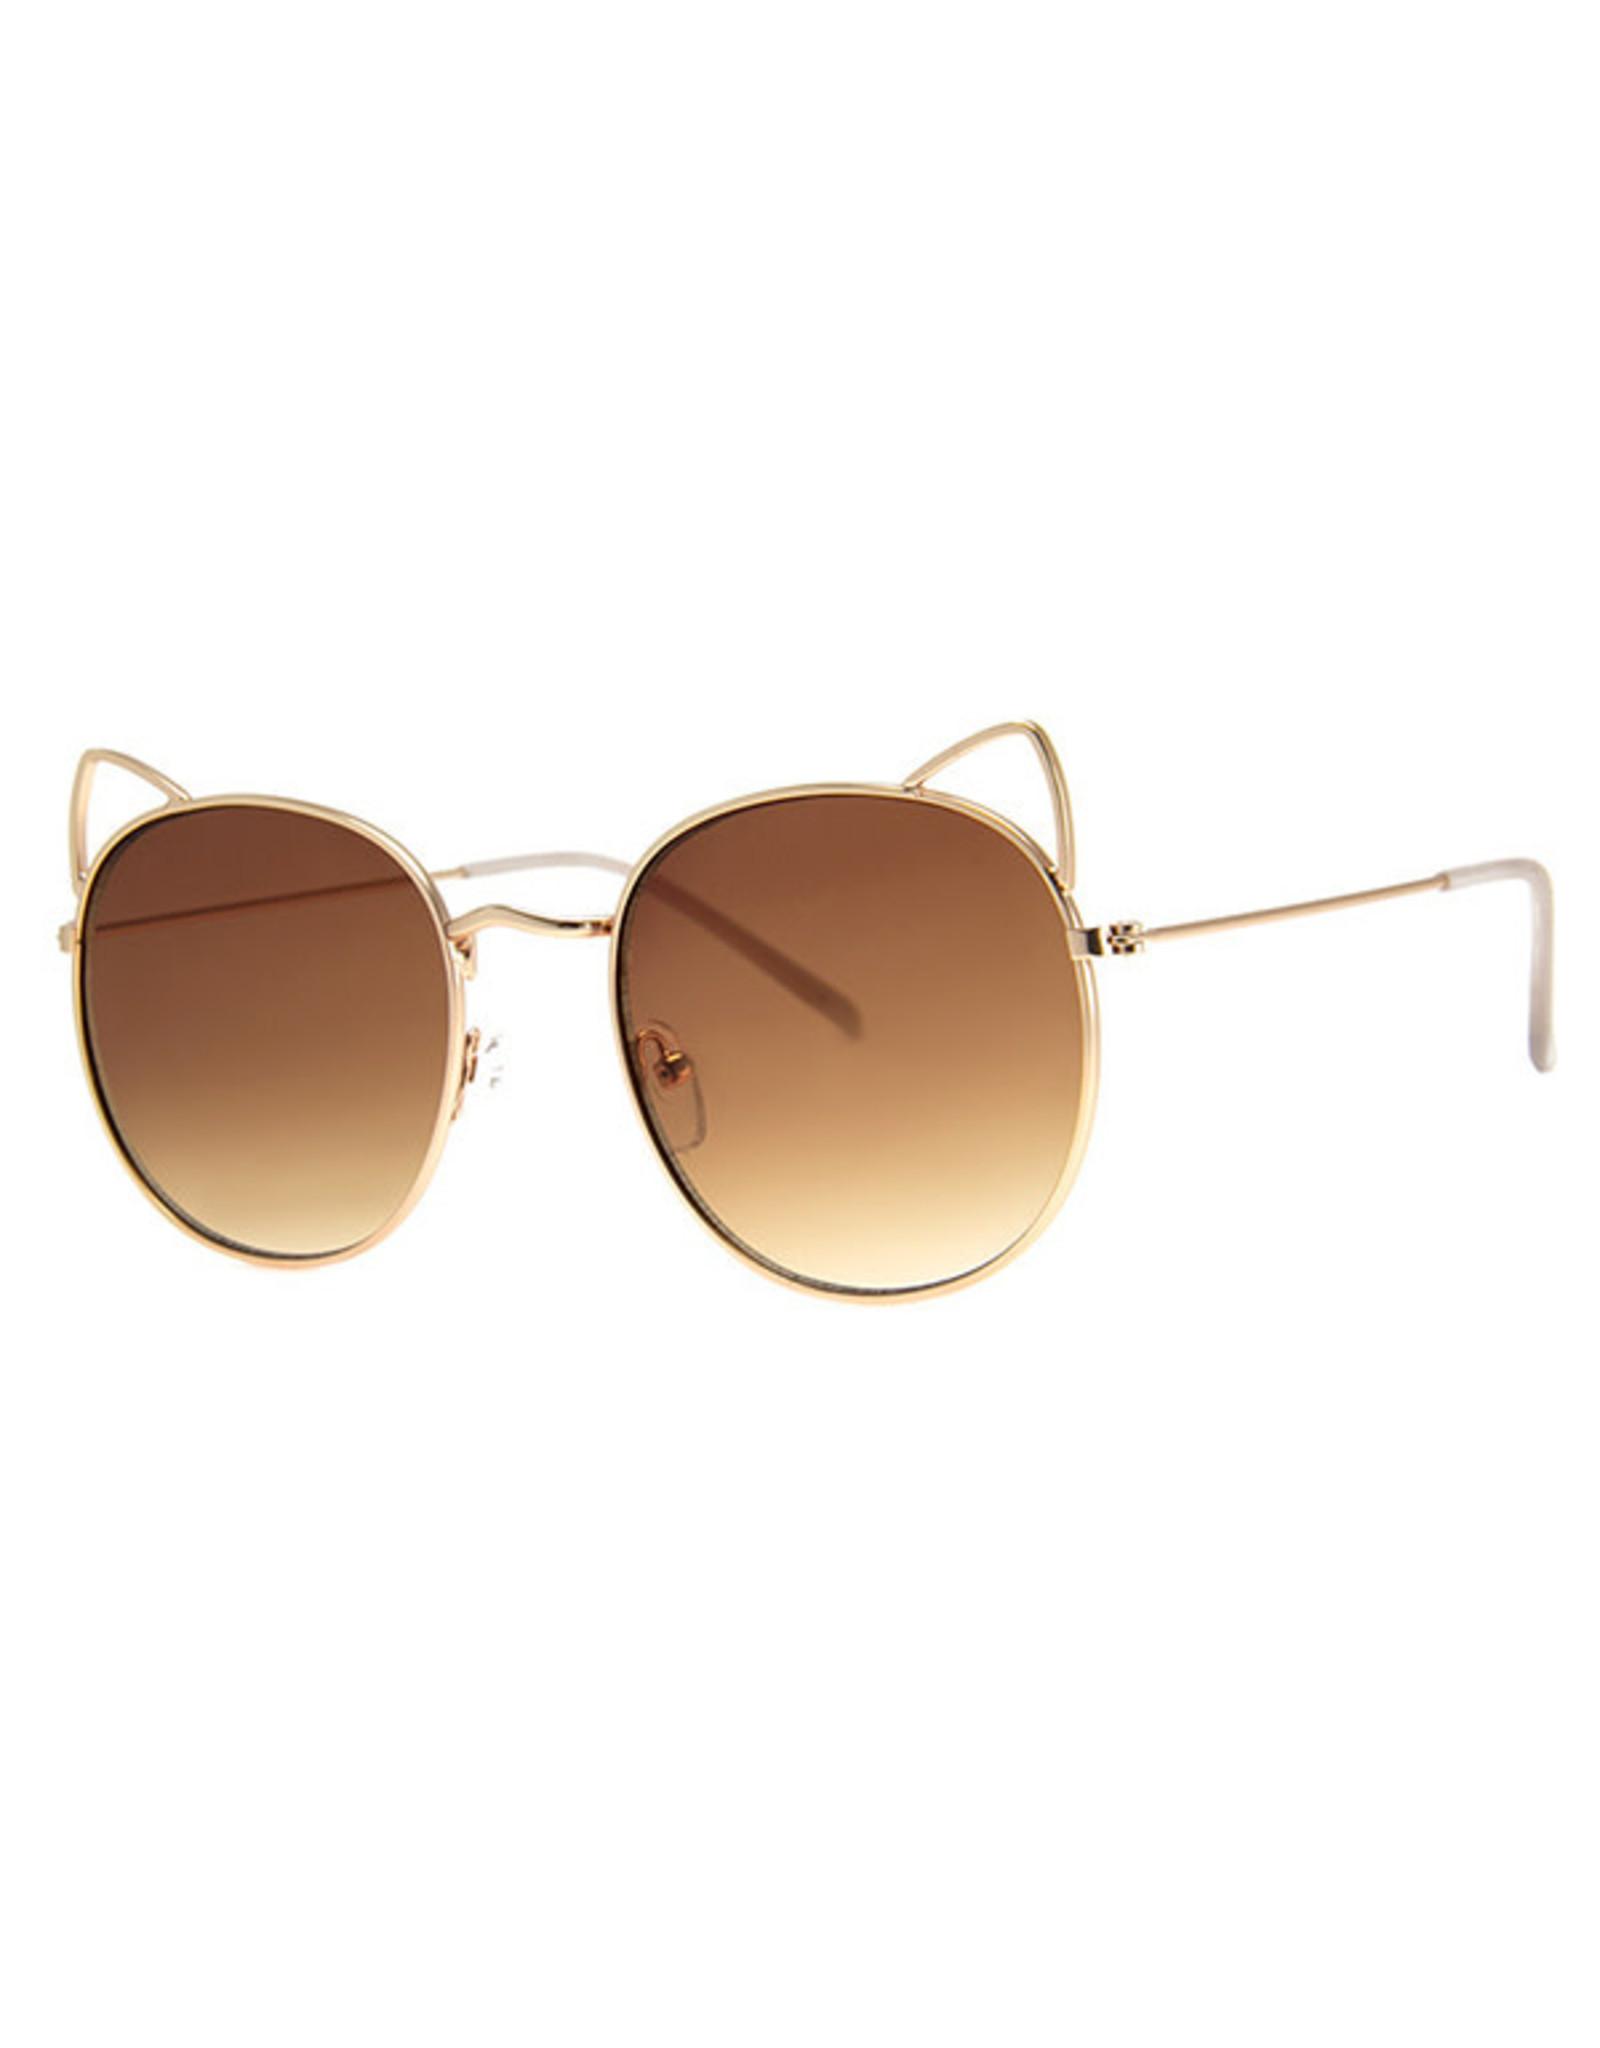 AJ Morgan AJM - Cat Ear Frame Sunglasses